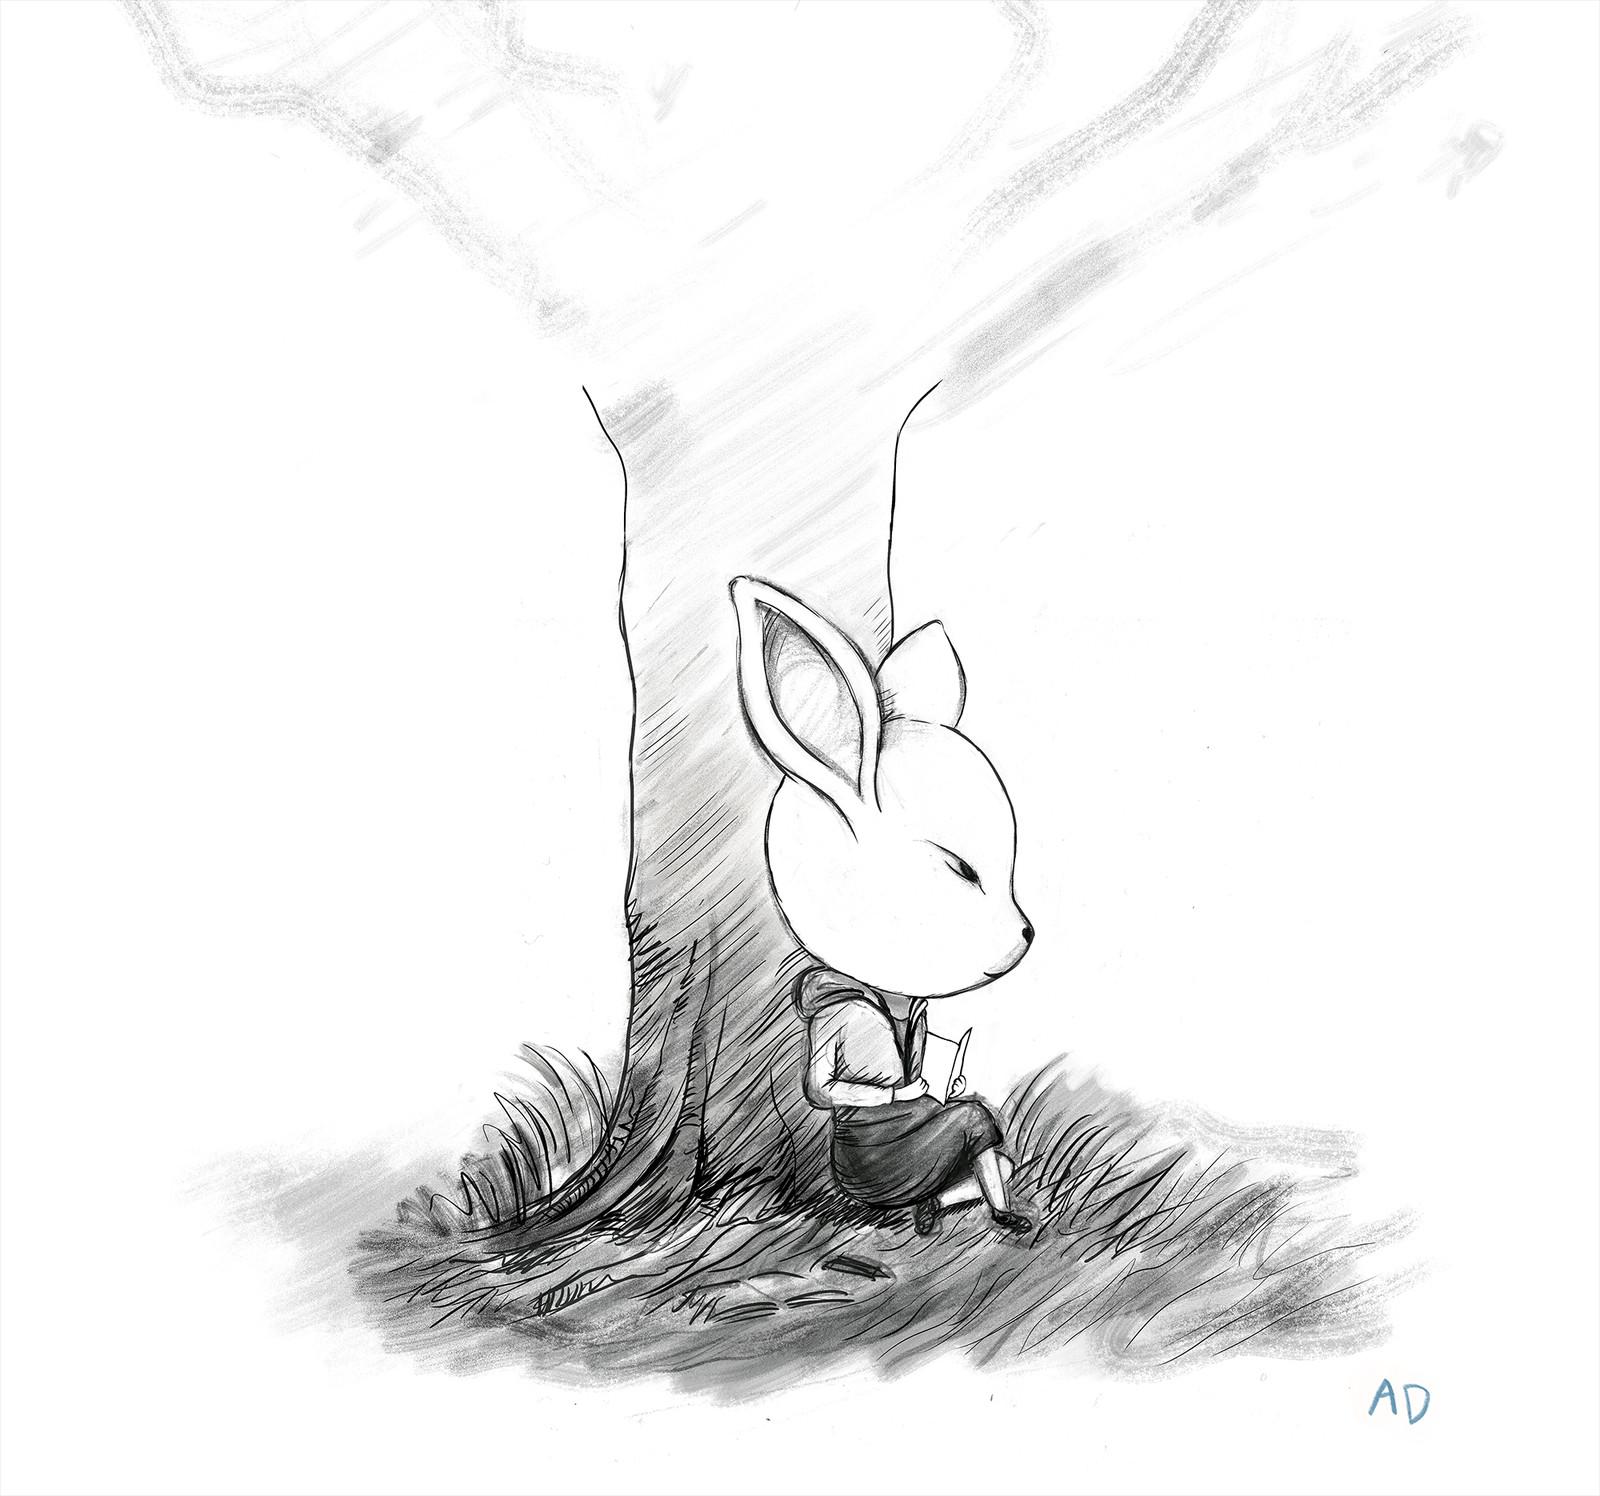 #Rabbit #sketch #pencil #reading #contemplation #nature #black #white #whiterabbit